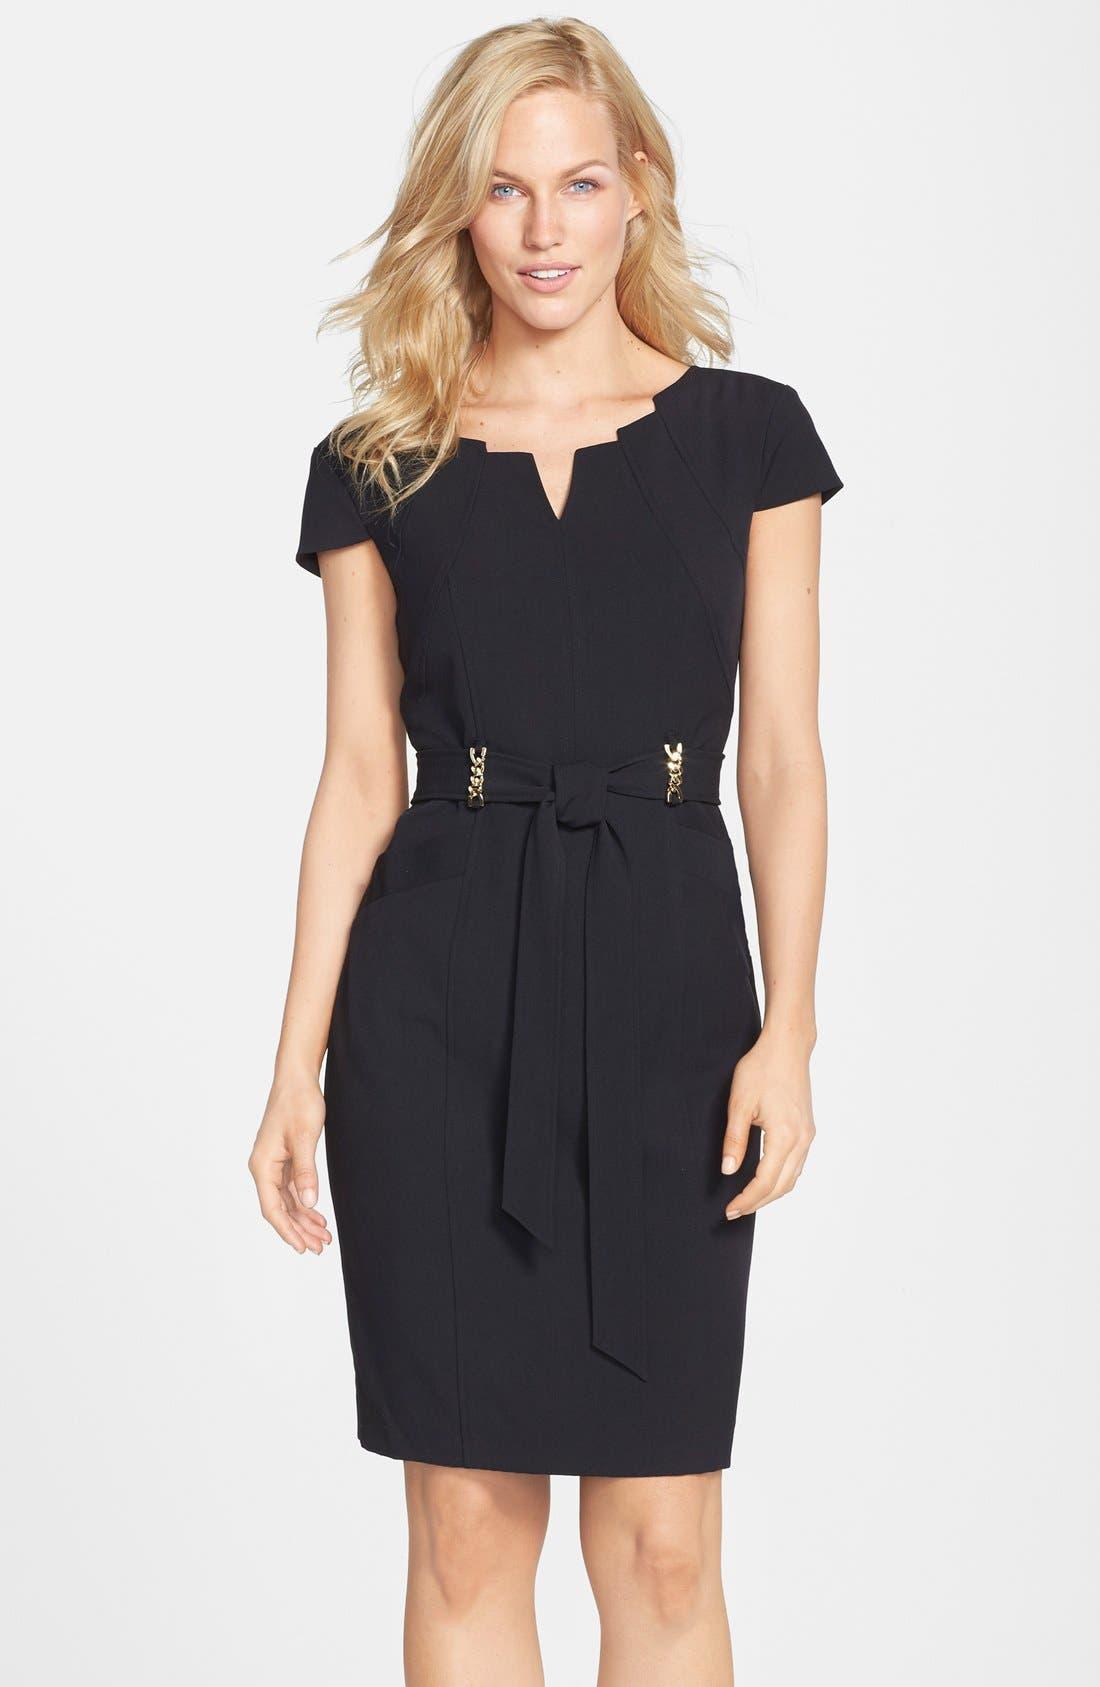 Alternate Image 1 Selected - Ellen Tracy Stretch Sheath Dress (Regular & Petite)